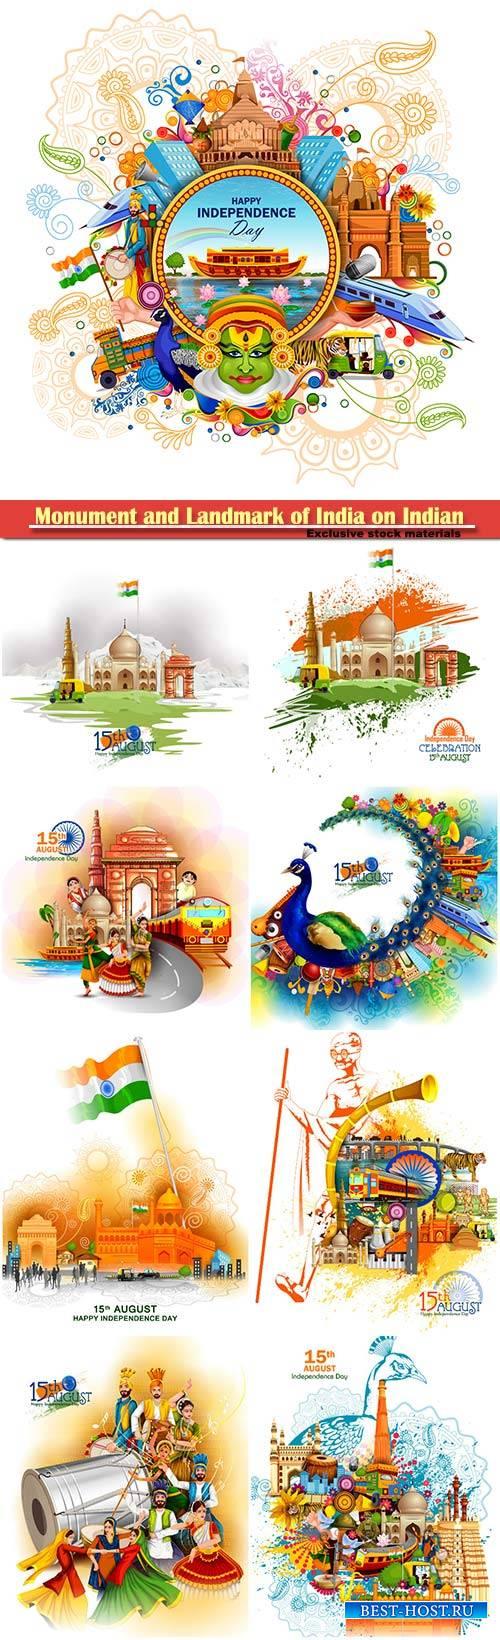 Monument and Landmark of India on Indian Independence Day celebration backg ...